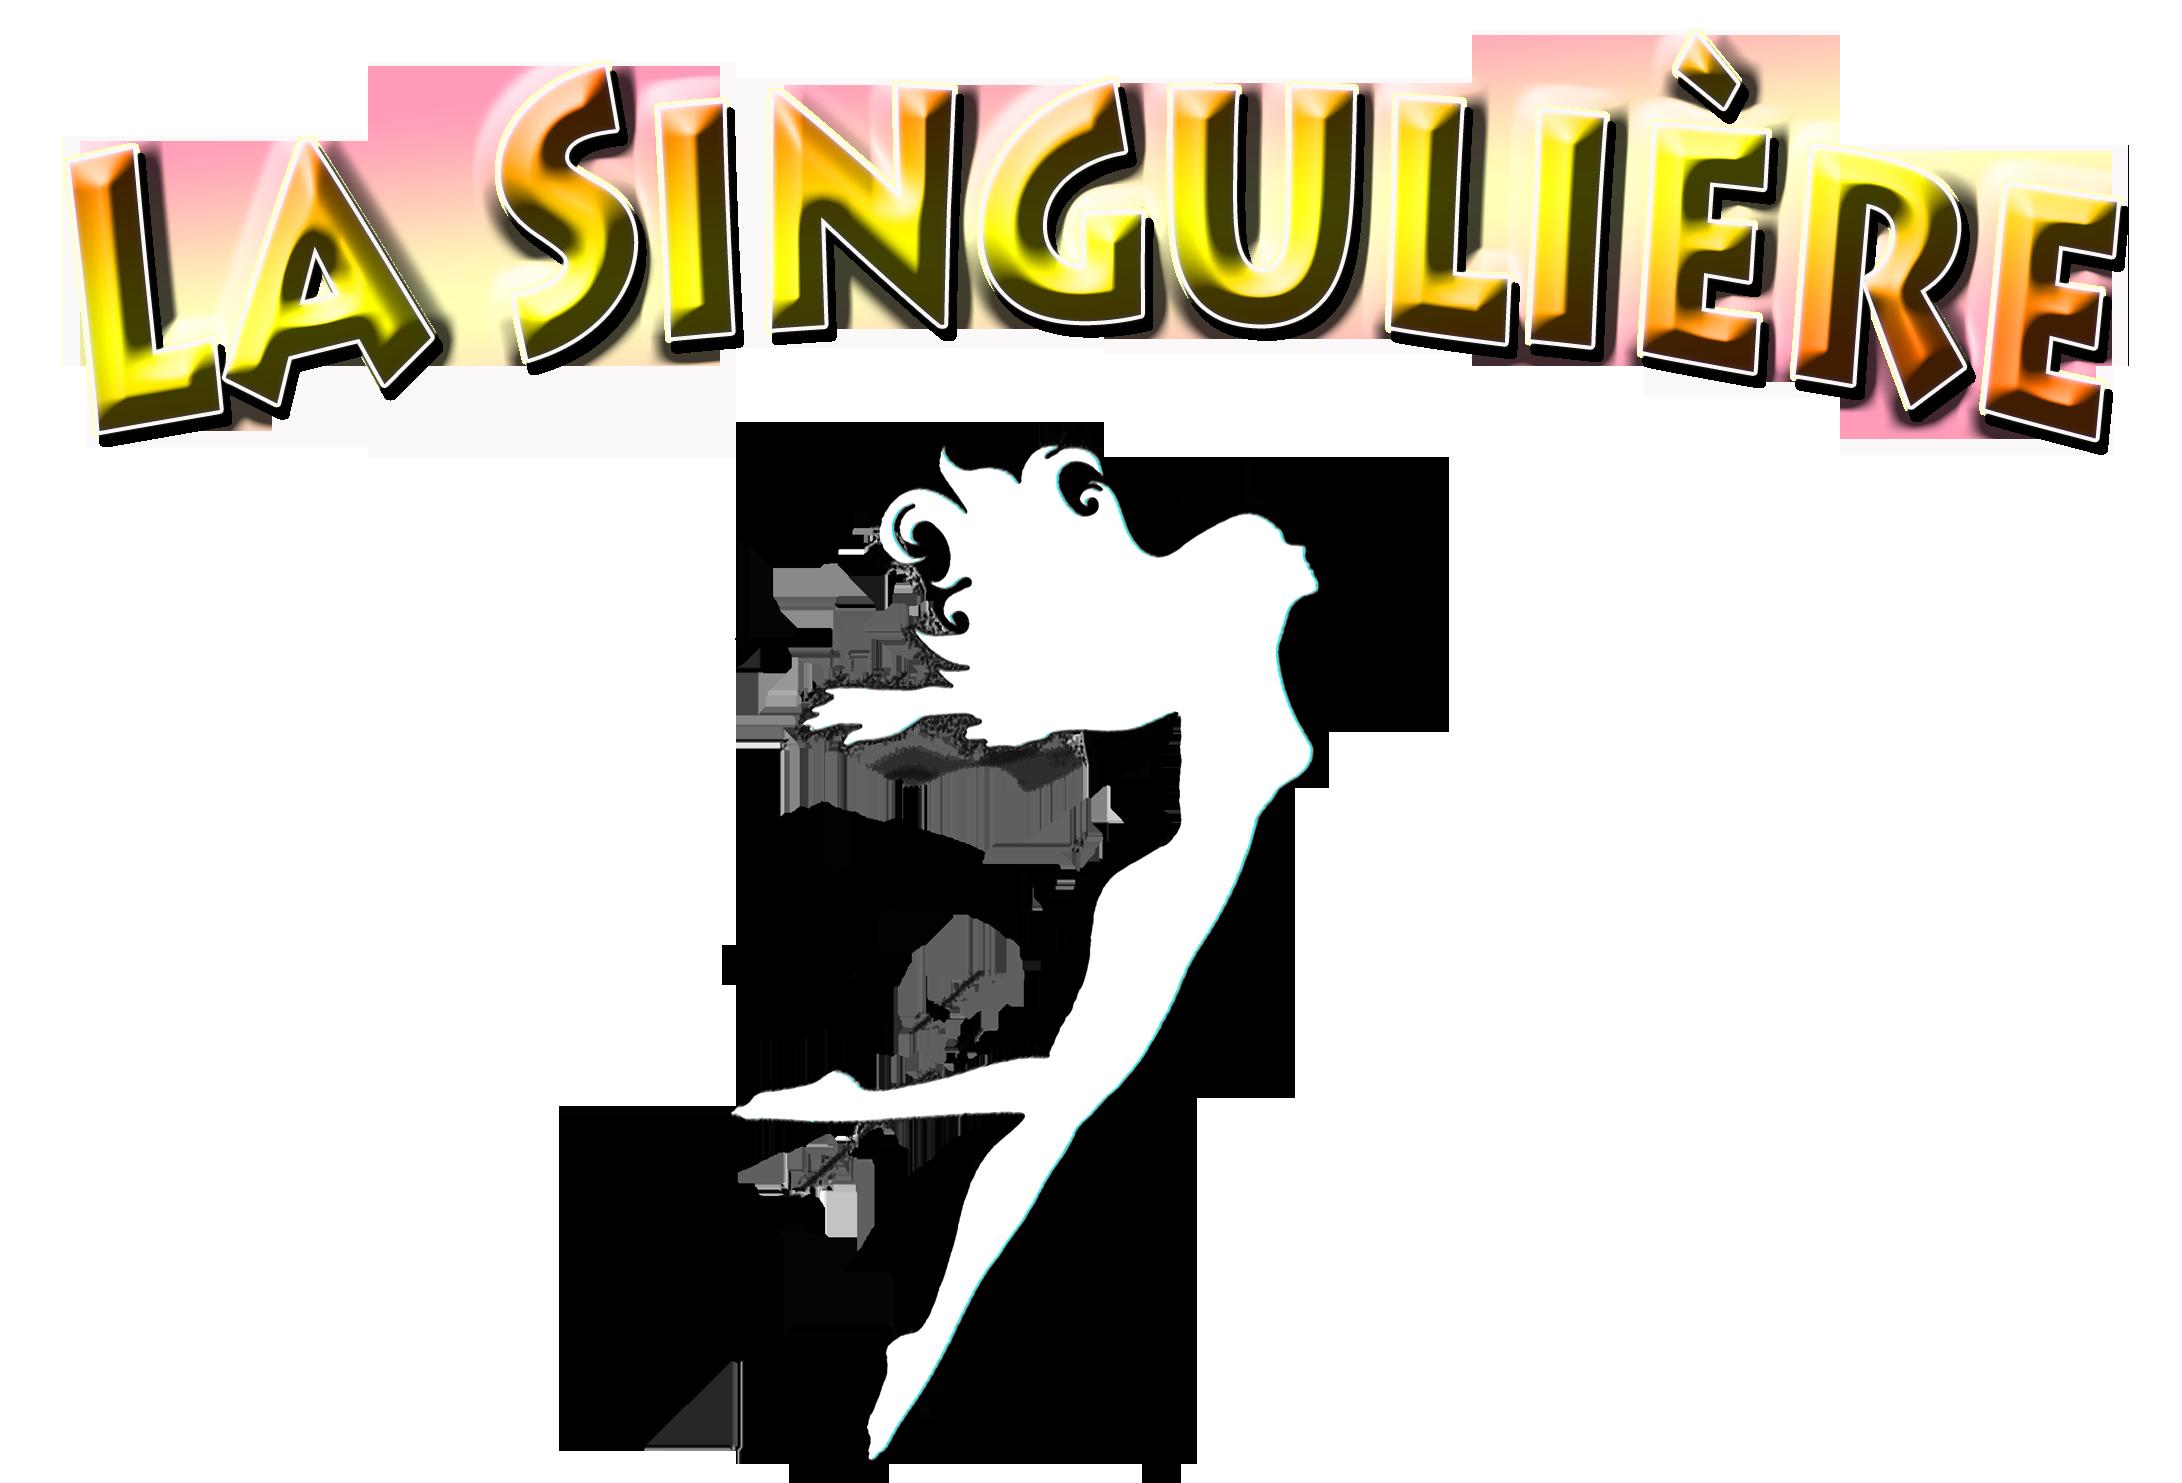 La Singulière